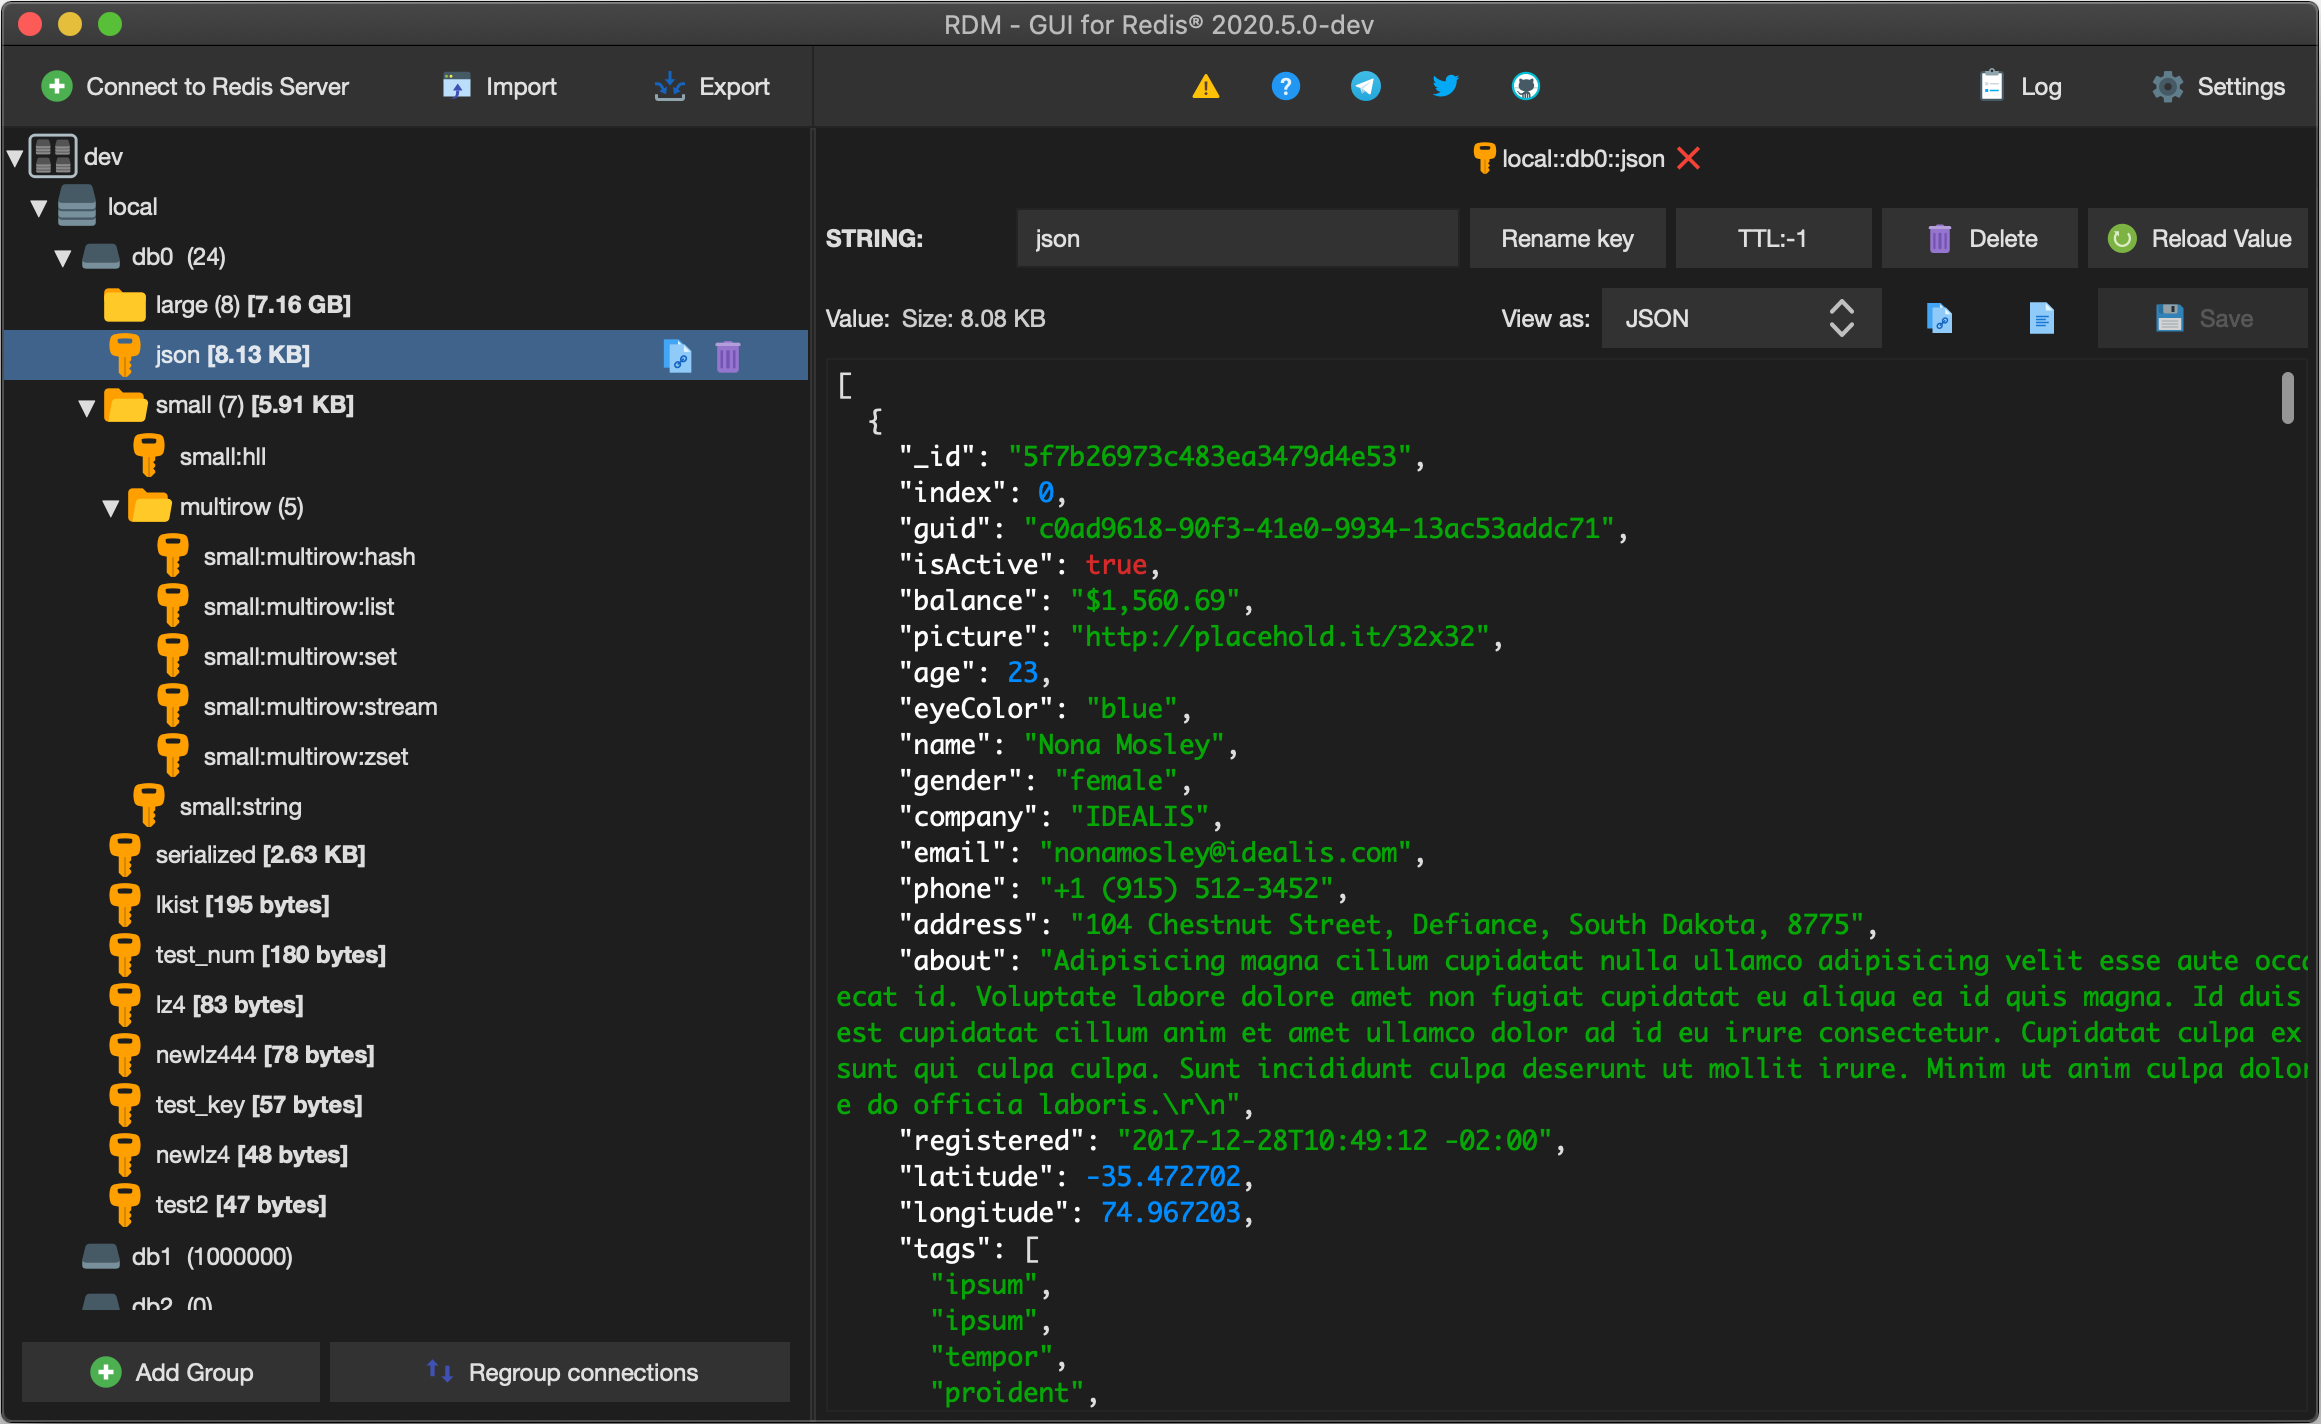 Redis Desktop Manager screenshoot